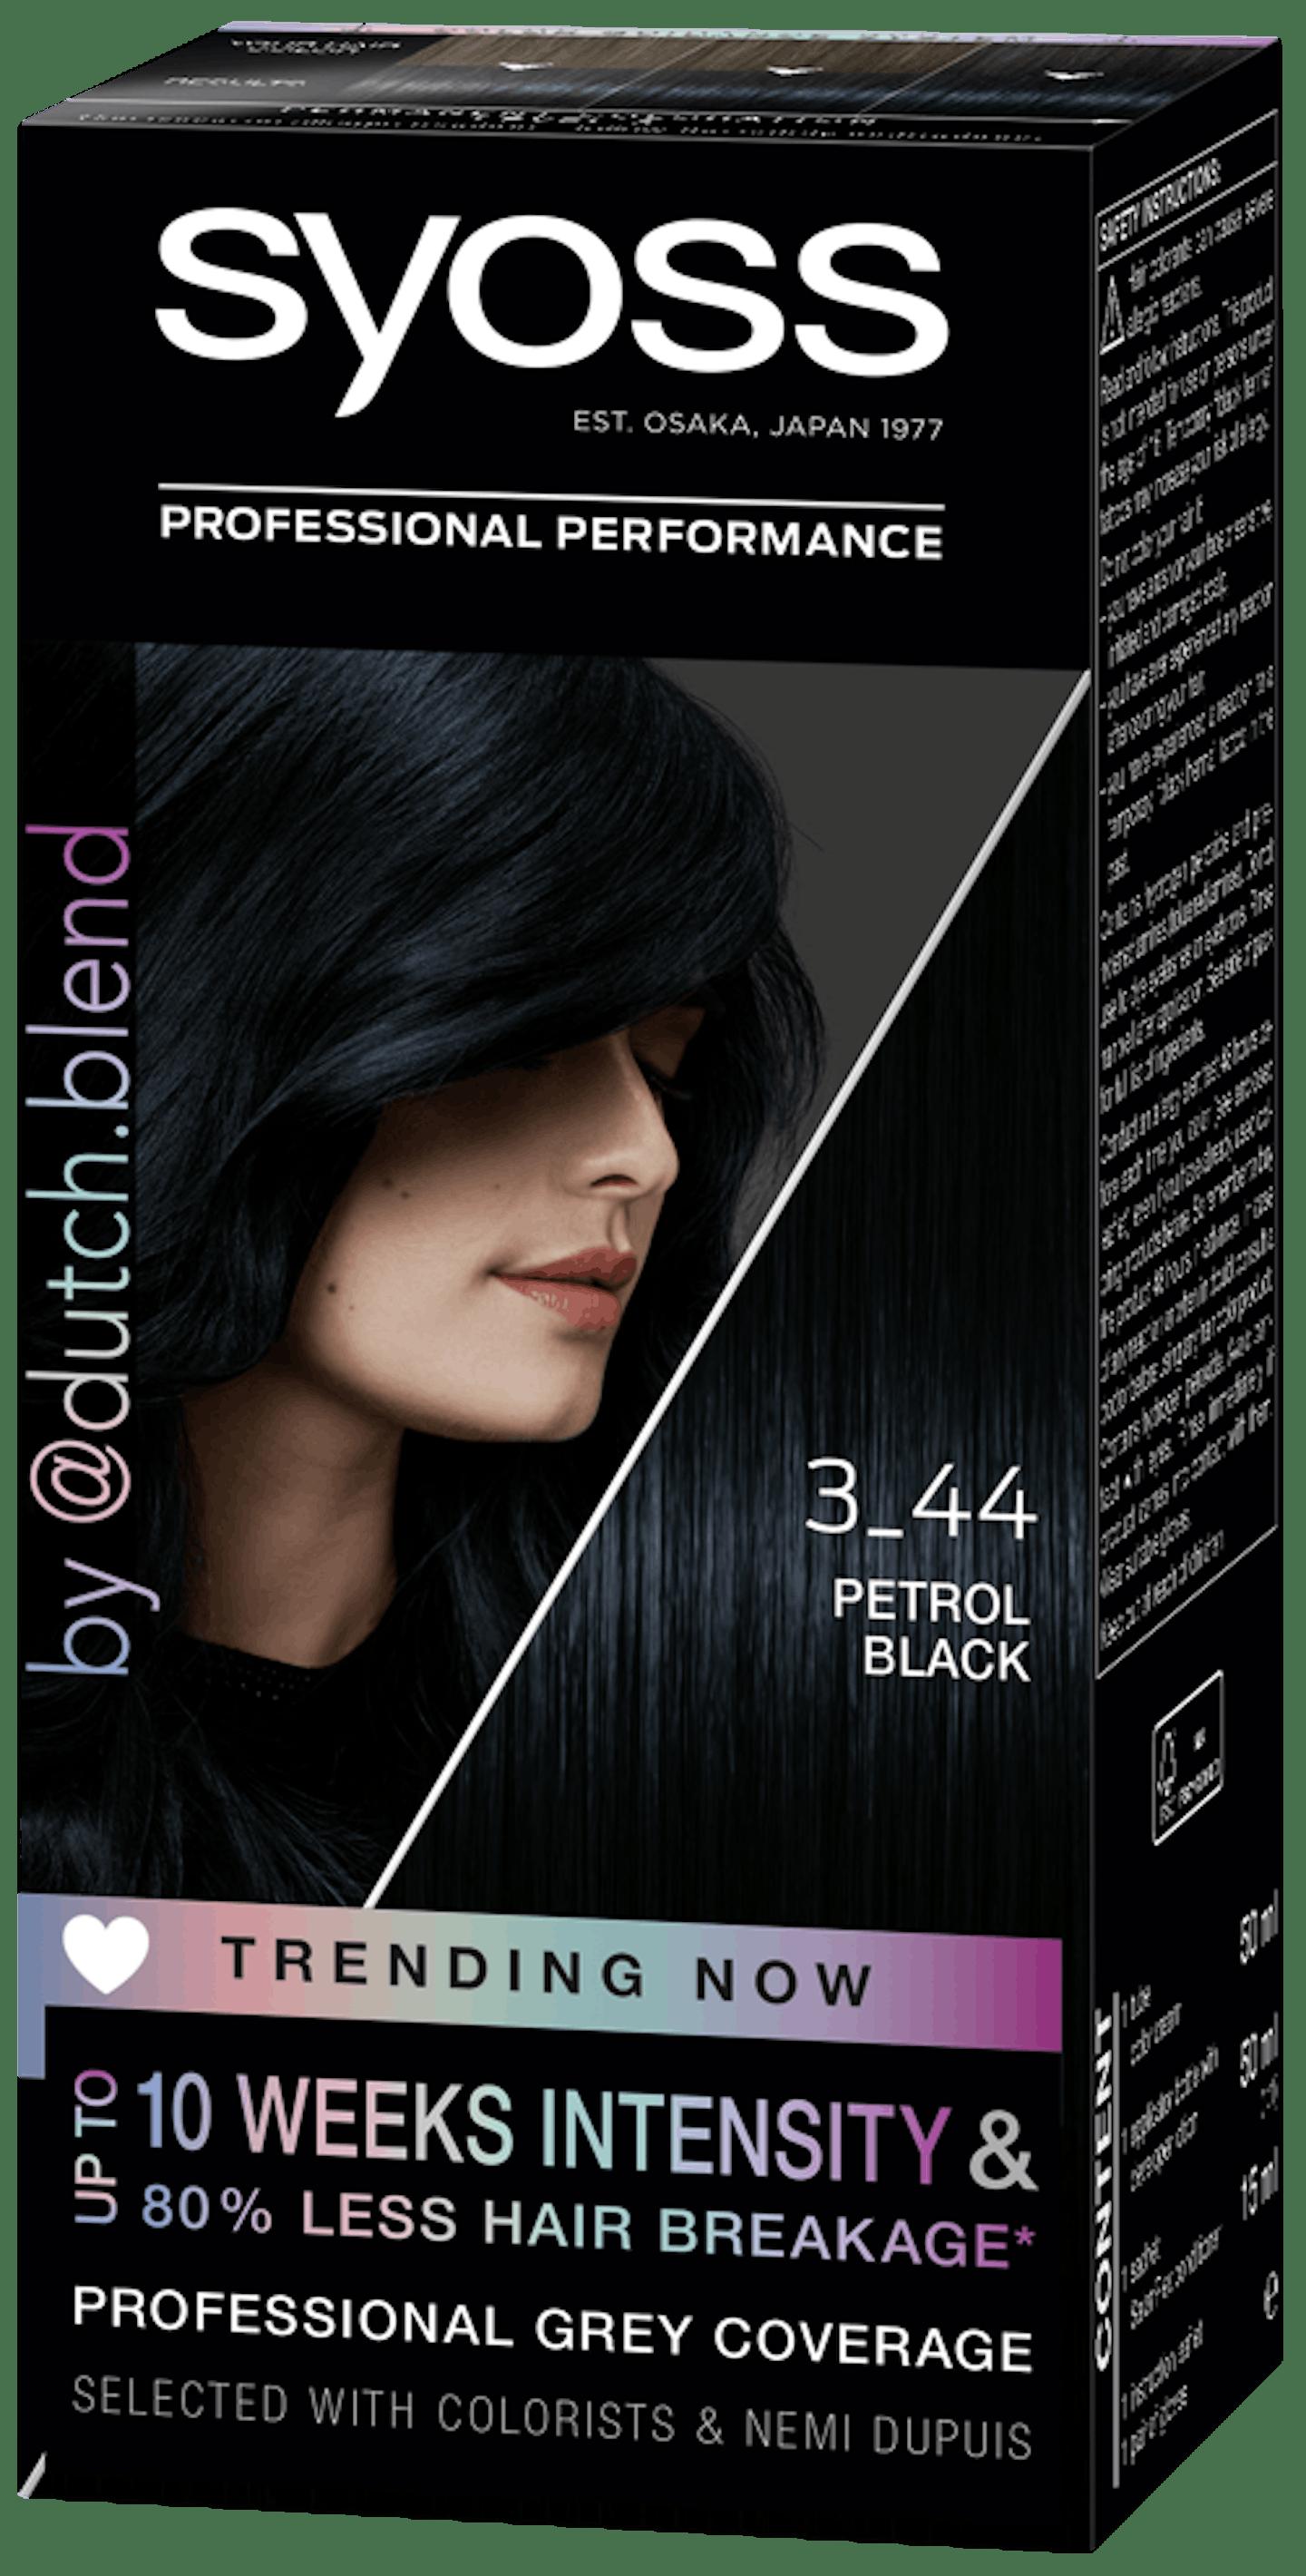 Petrol Black 3_44